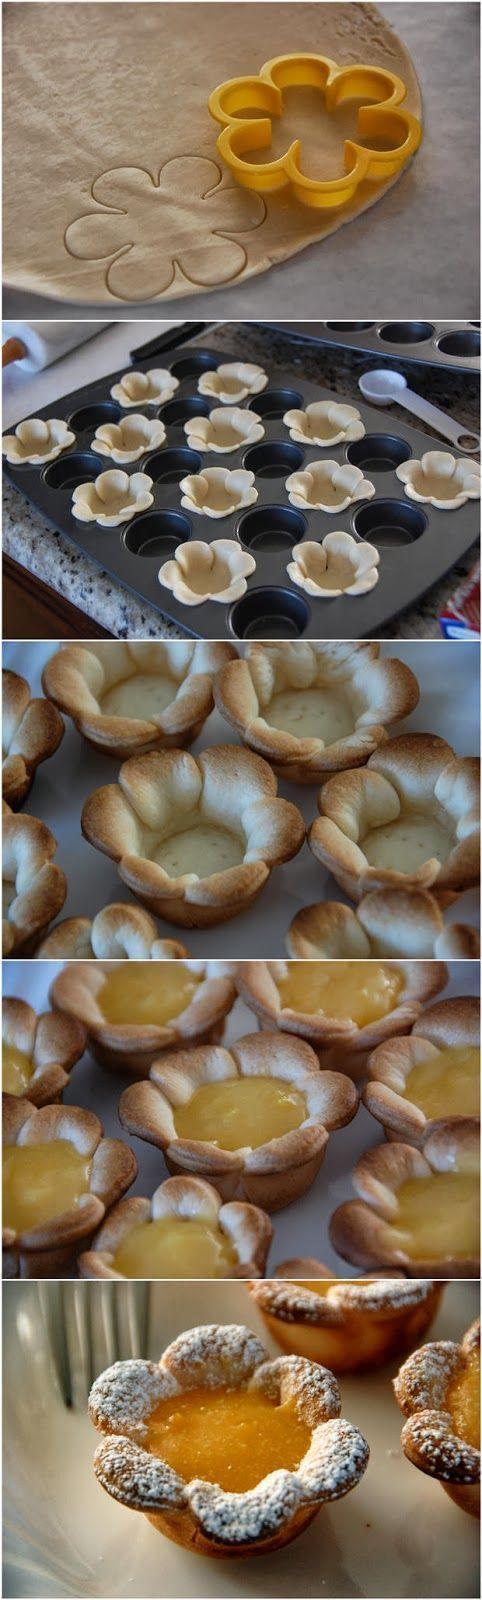 Tartaletas Lemon Curd http://www.the350degreeoven.com/2011/06/pastries-pies/flower-shaped-mini-lemoncurd-tarts/